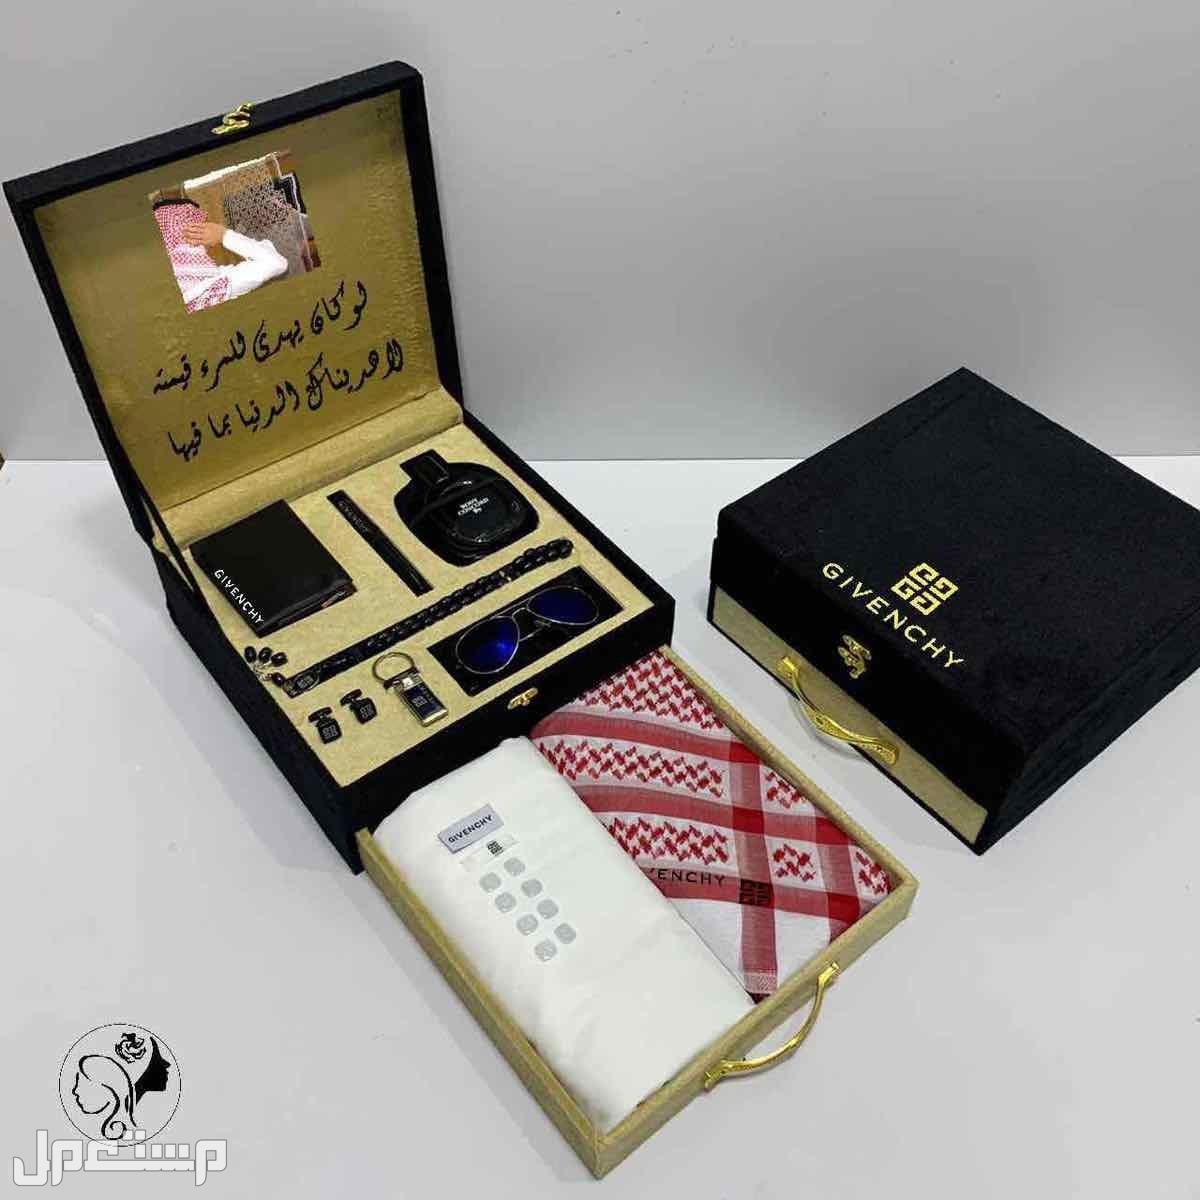 بوكس هدايا رجالي جيفنشي قماش شماغ نظاره قلم كبك مسبحه محفظه